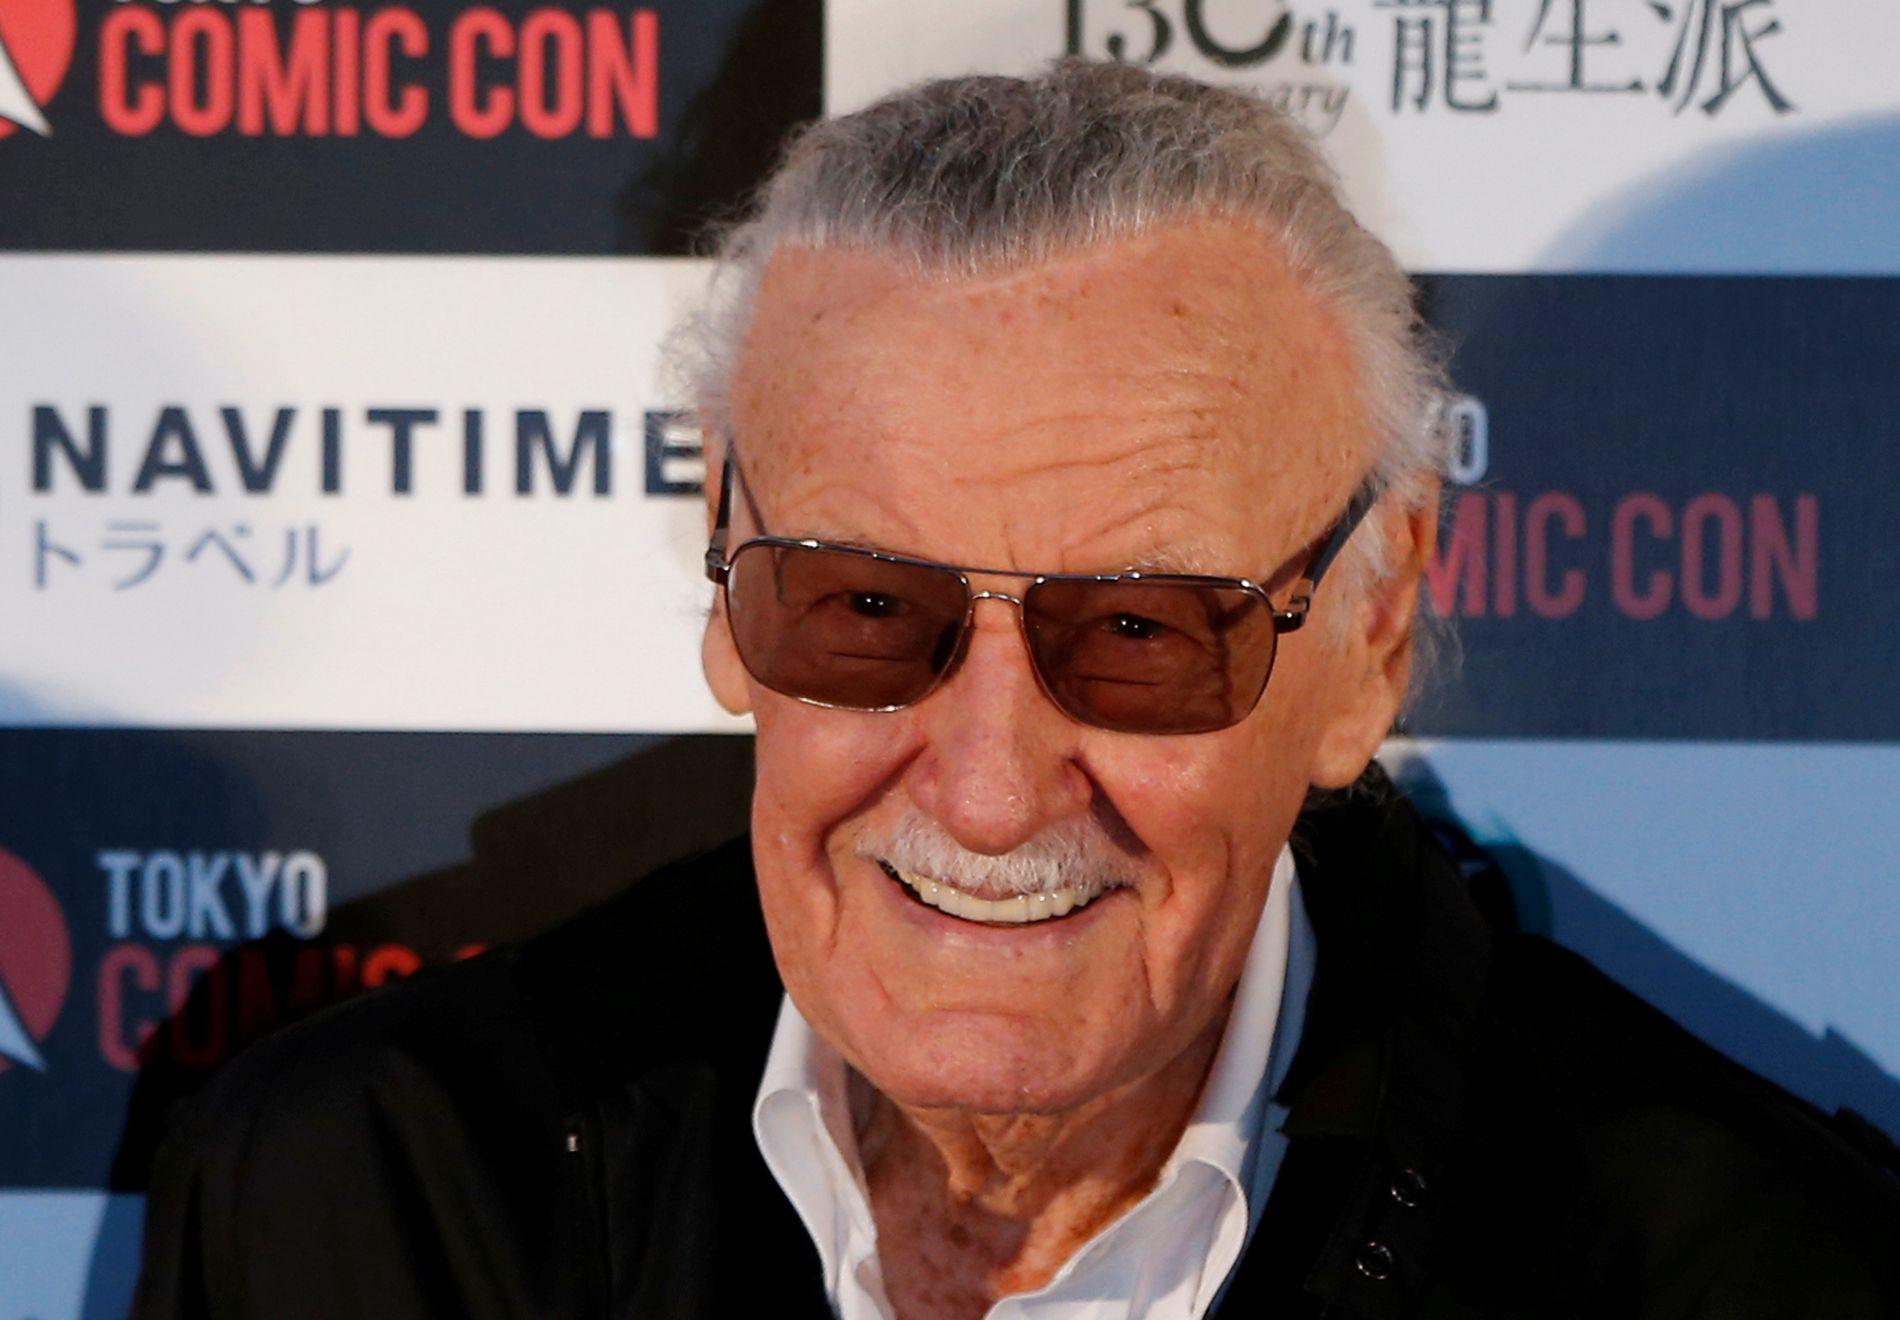 DØD: Datteren bekrefter at Stan Lee døde på sykehuset.